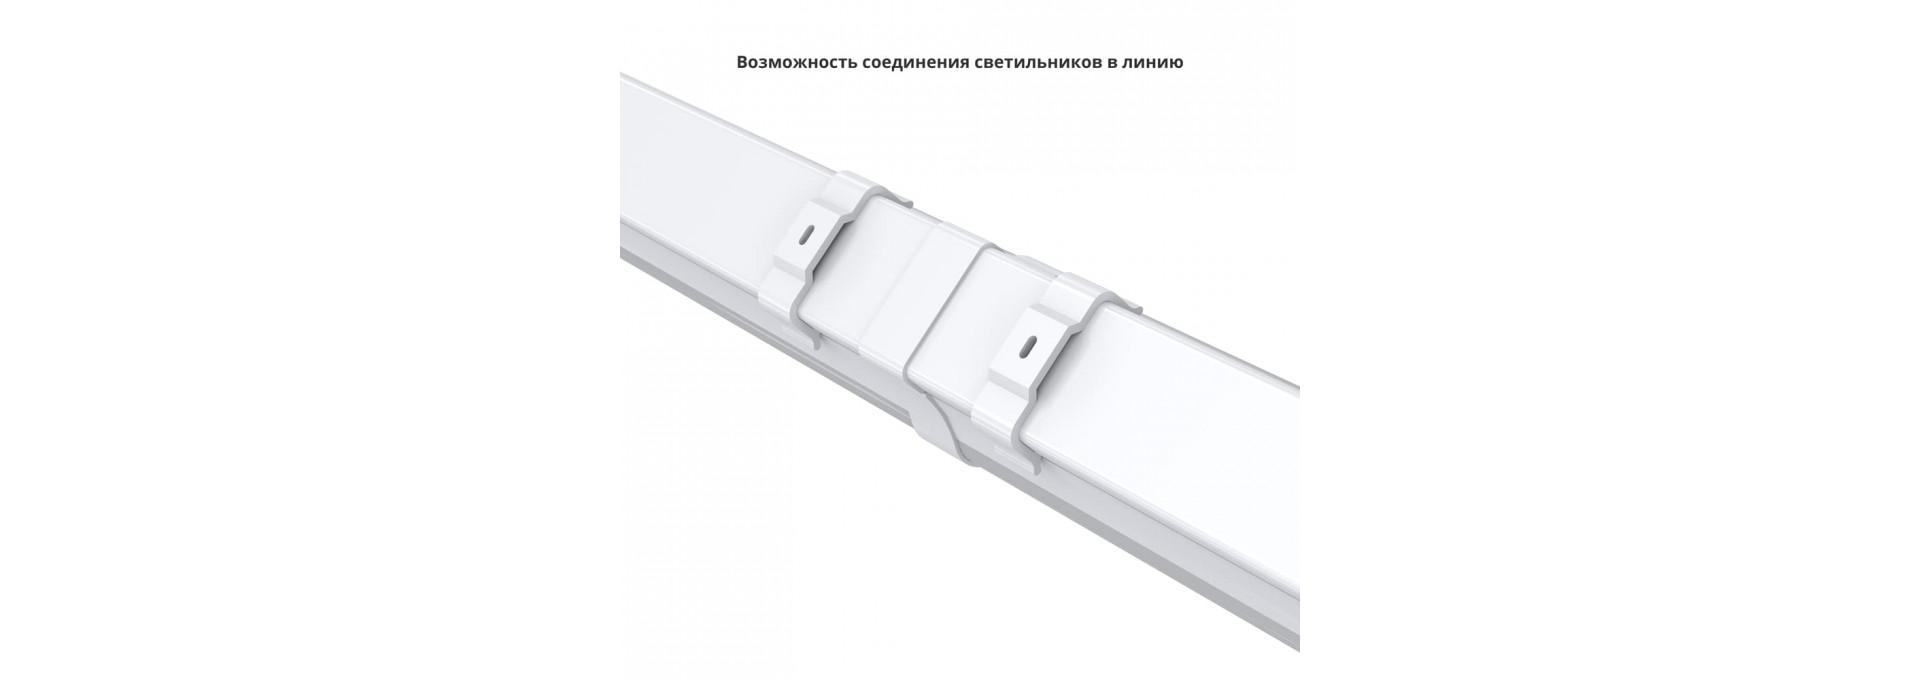 Айсберг v2.0 20 600мм ЭКО 6500К Прозрачный